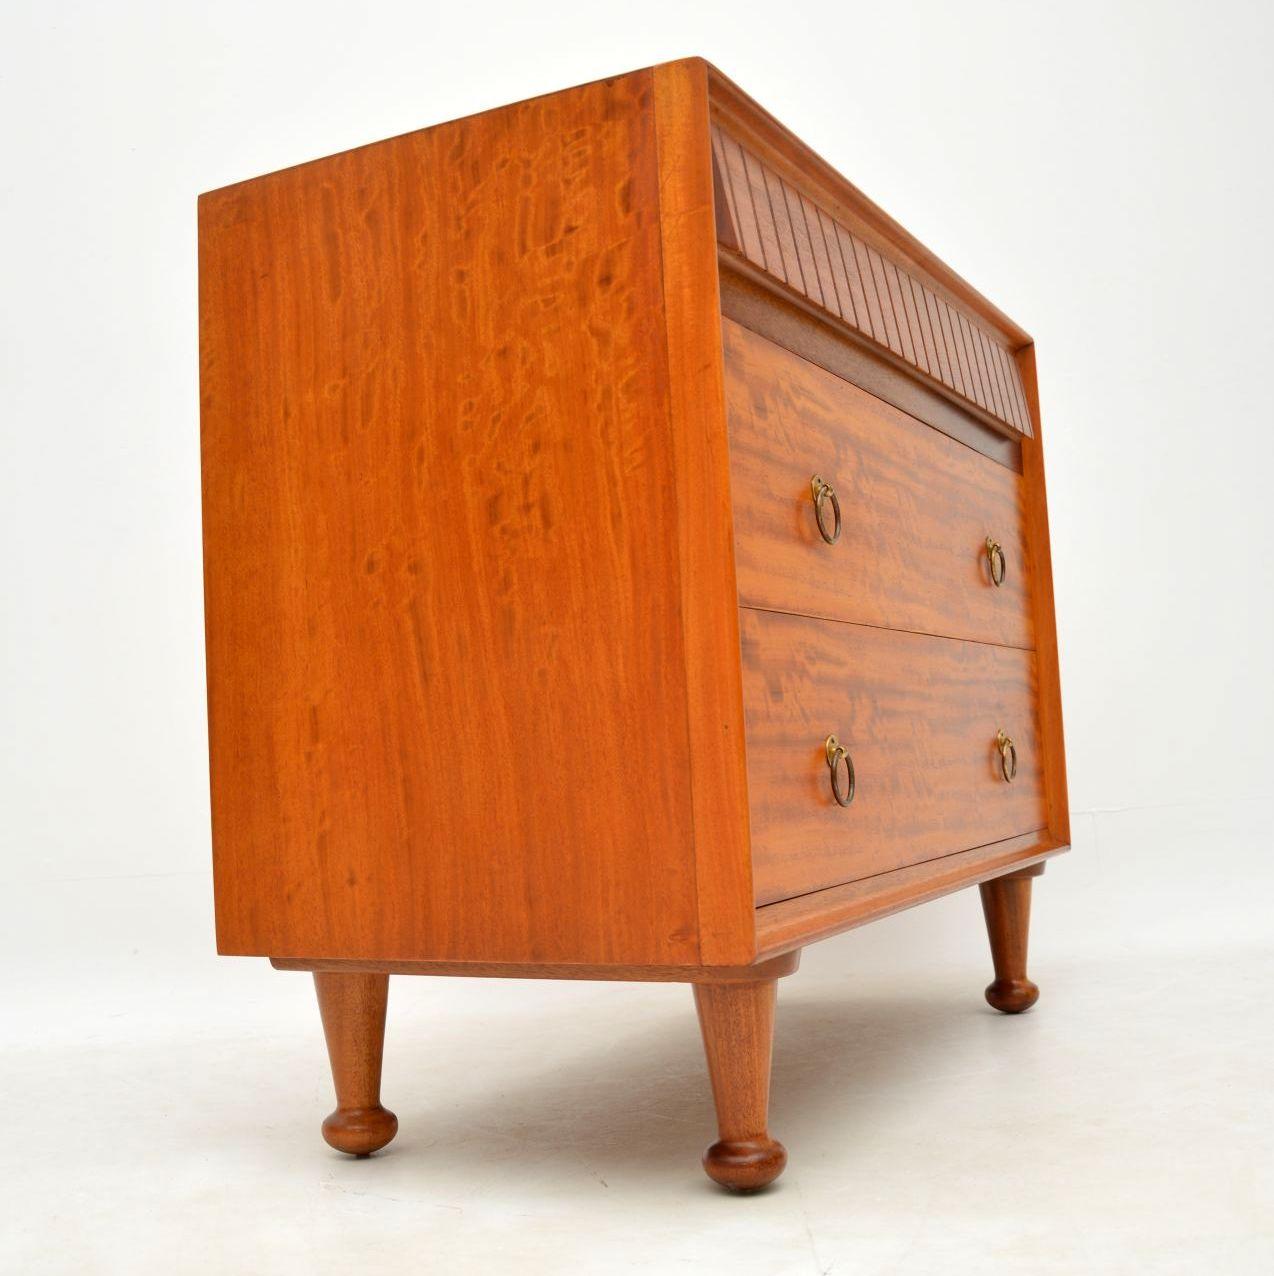 retro_vintage_satinwood_heals_chest_of_drawers_9